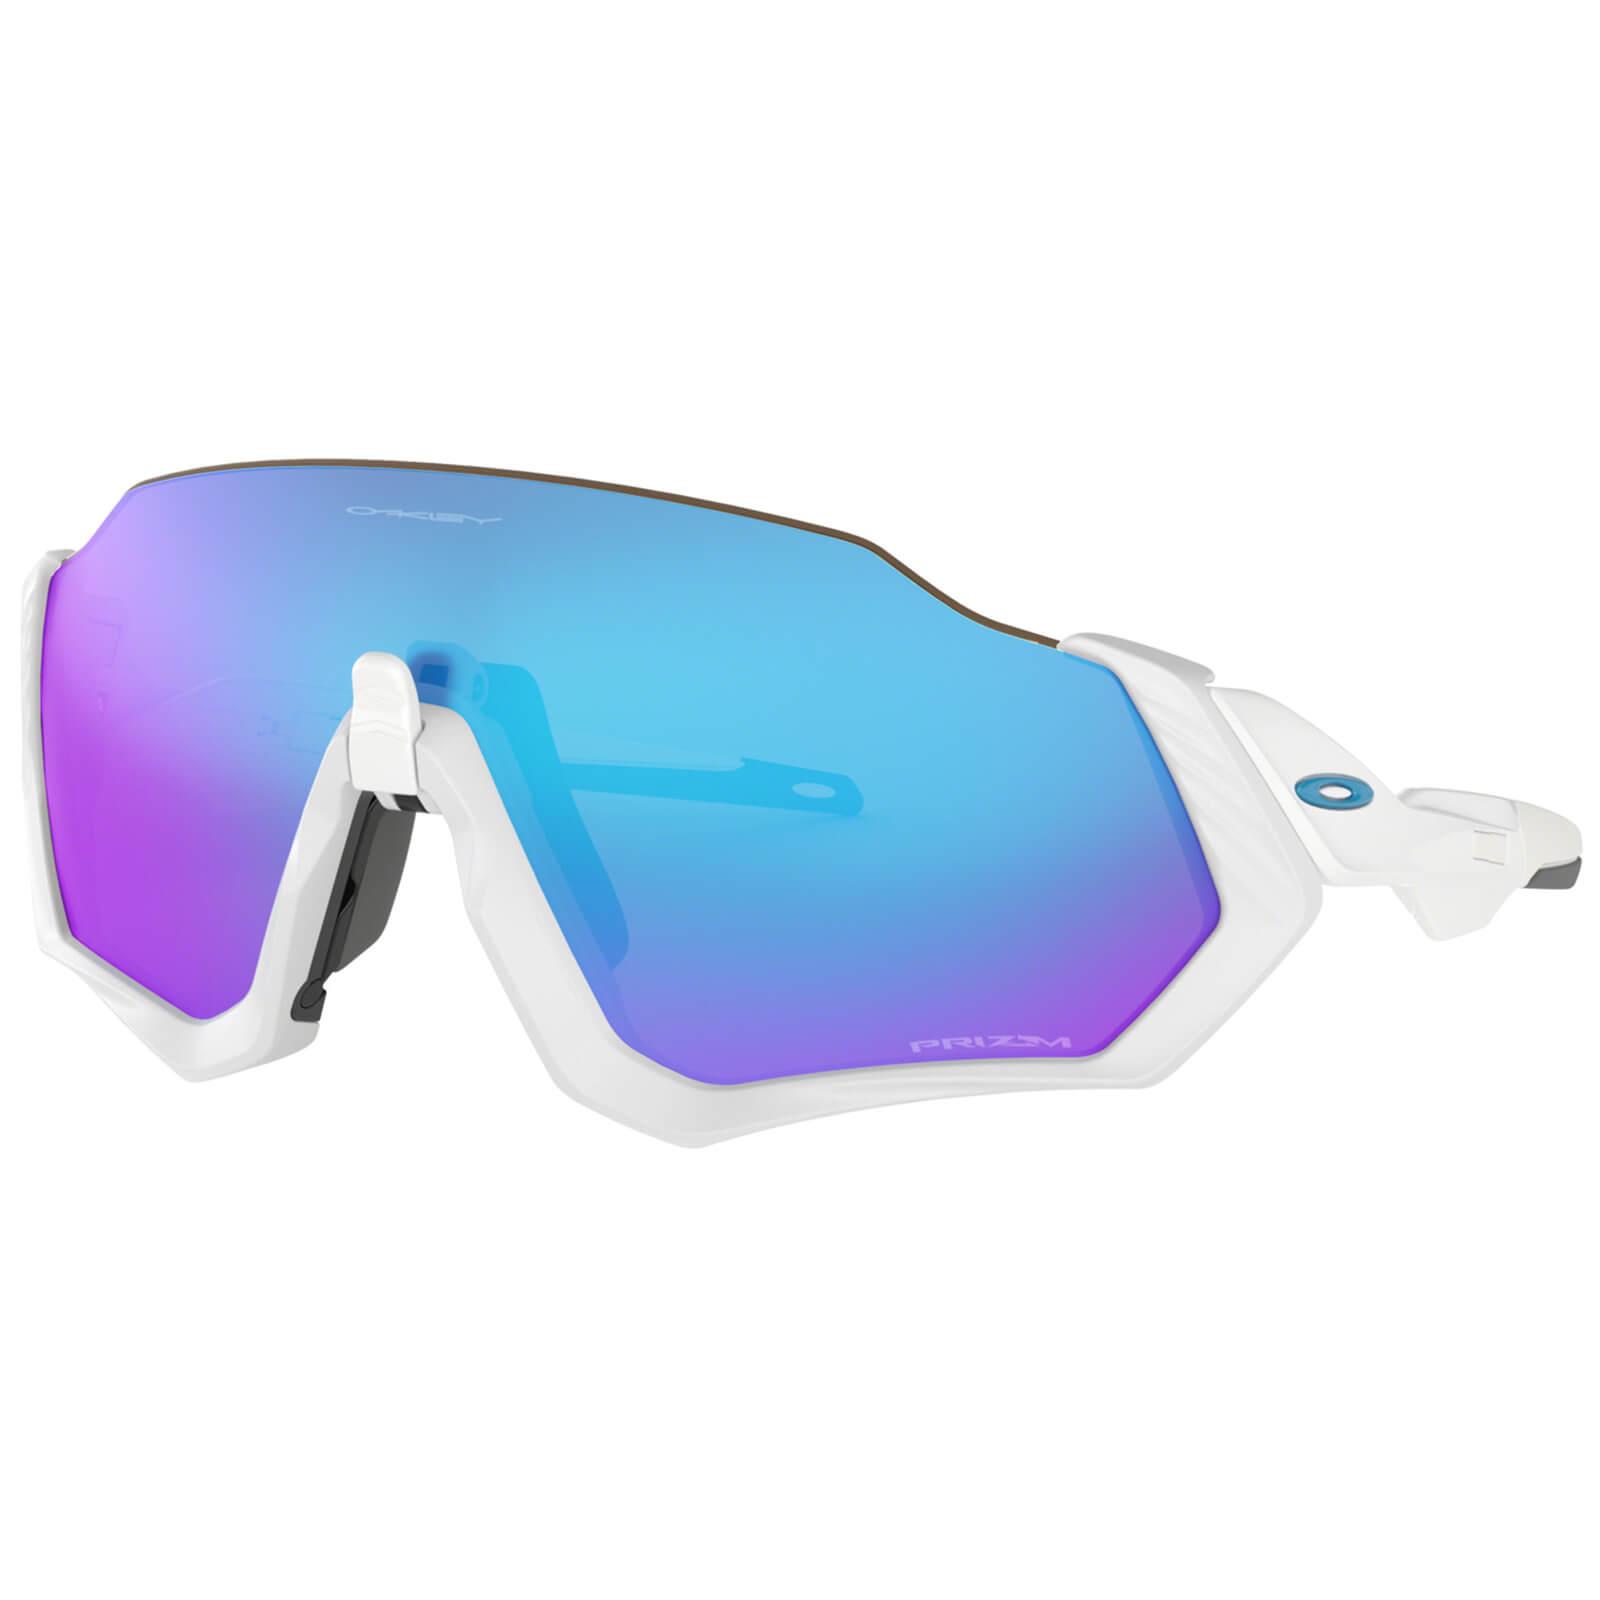 a2974dc52b272 Oakley Flight Jacket Sunglasses - Polished White Prizm Sapphire ...